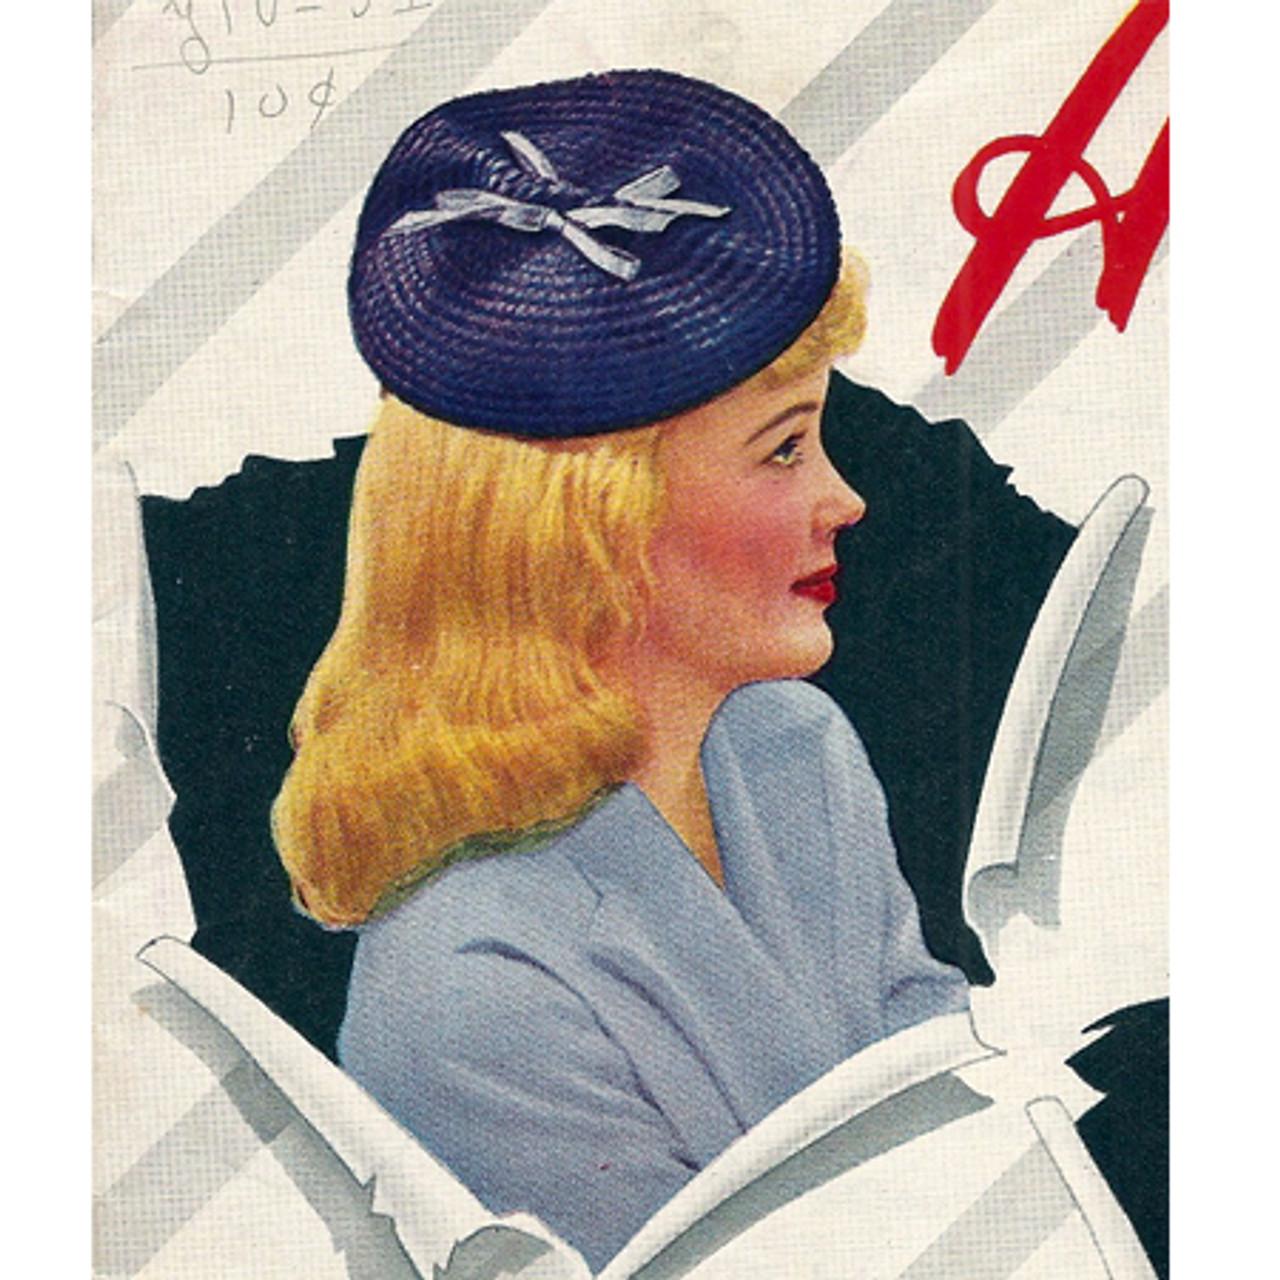 Vintage 1940's crocheted beret pattern